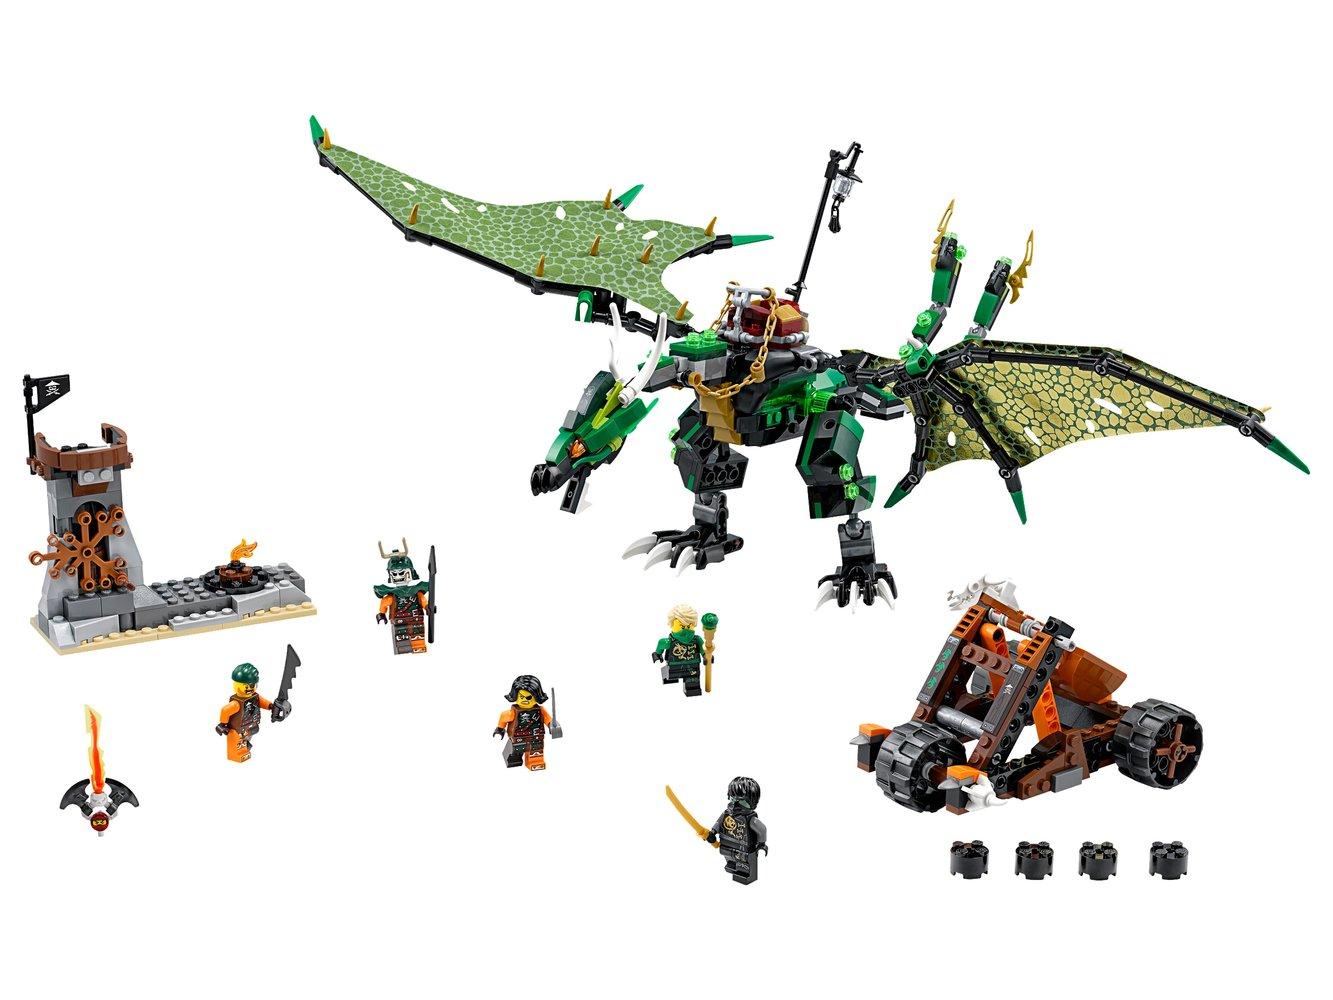 The Green NRG Dragon